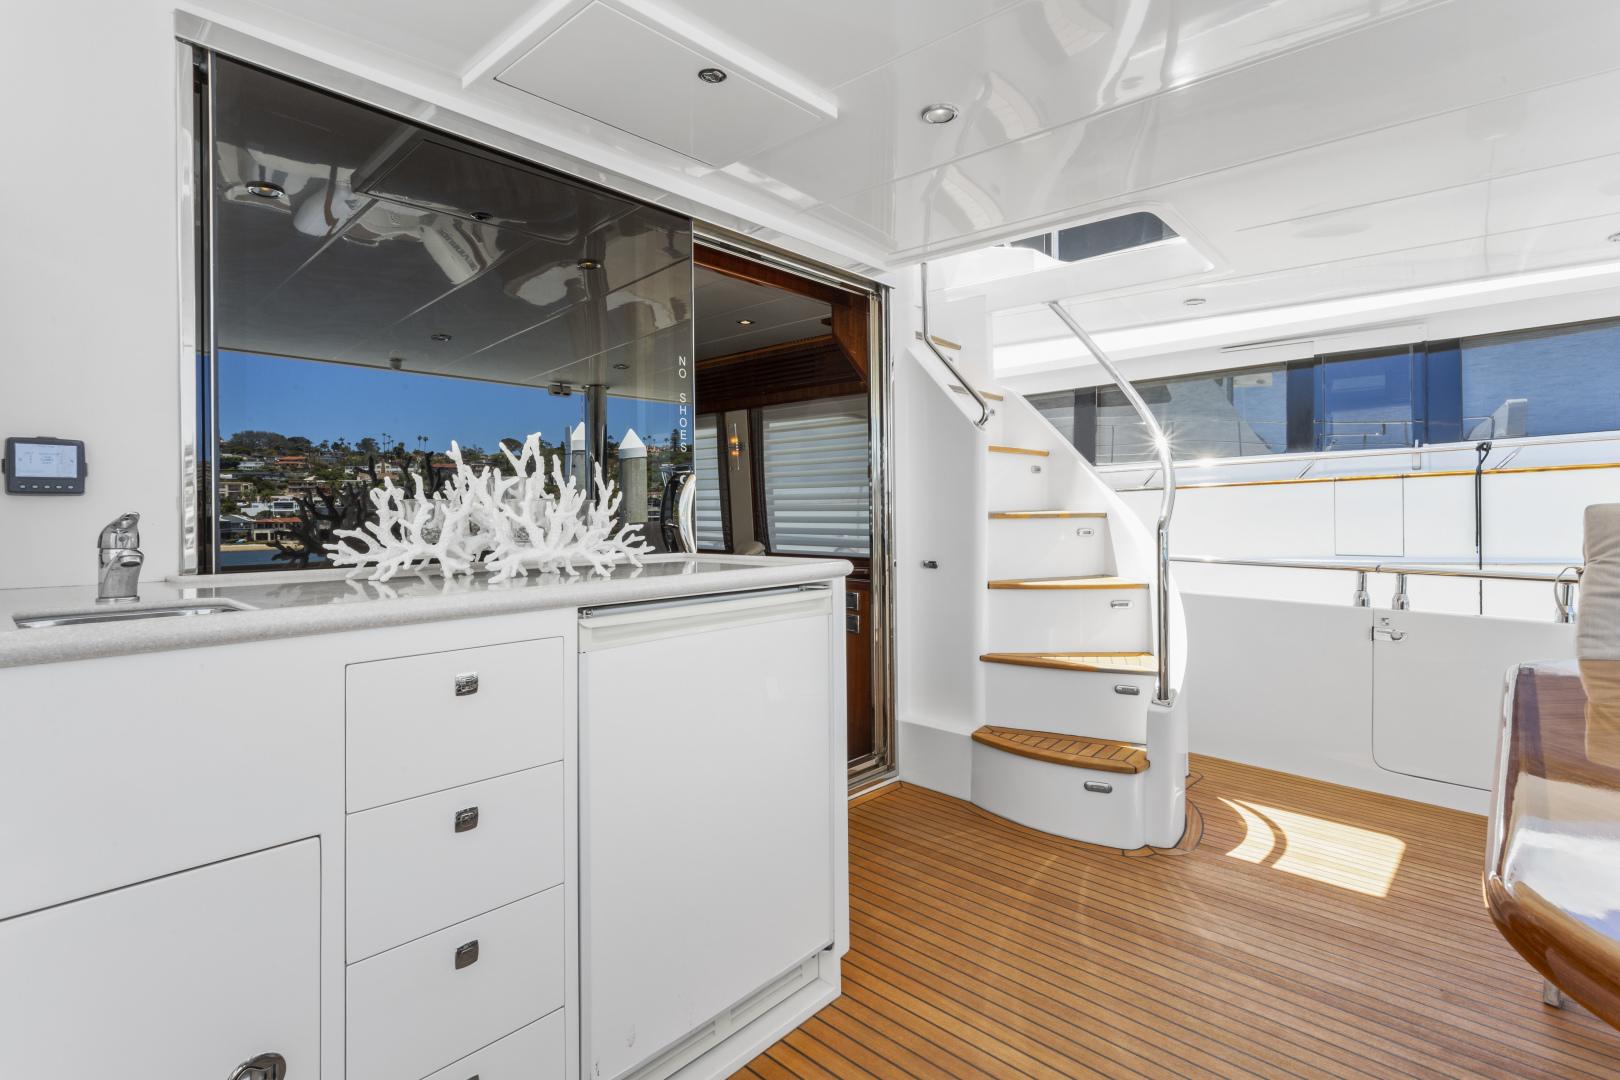 Hampton-76 Skylounge Motoryacht 2014-ODYSEA San Diego-California-United States-AFT DECK-1165181 | Thumbnail